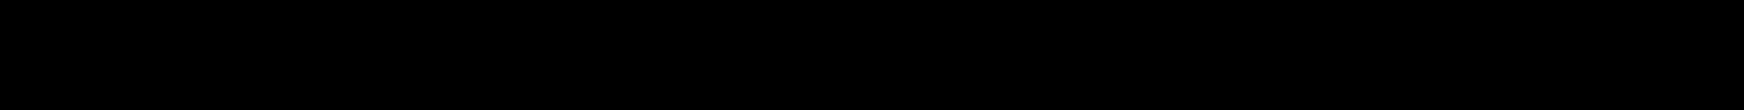 cf_semplice_pro_rg-webfont.ttf